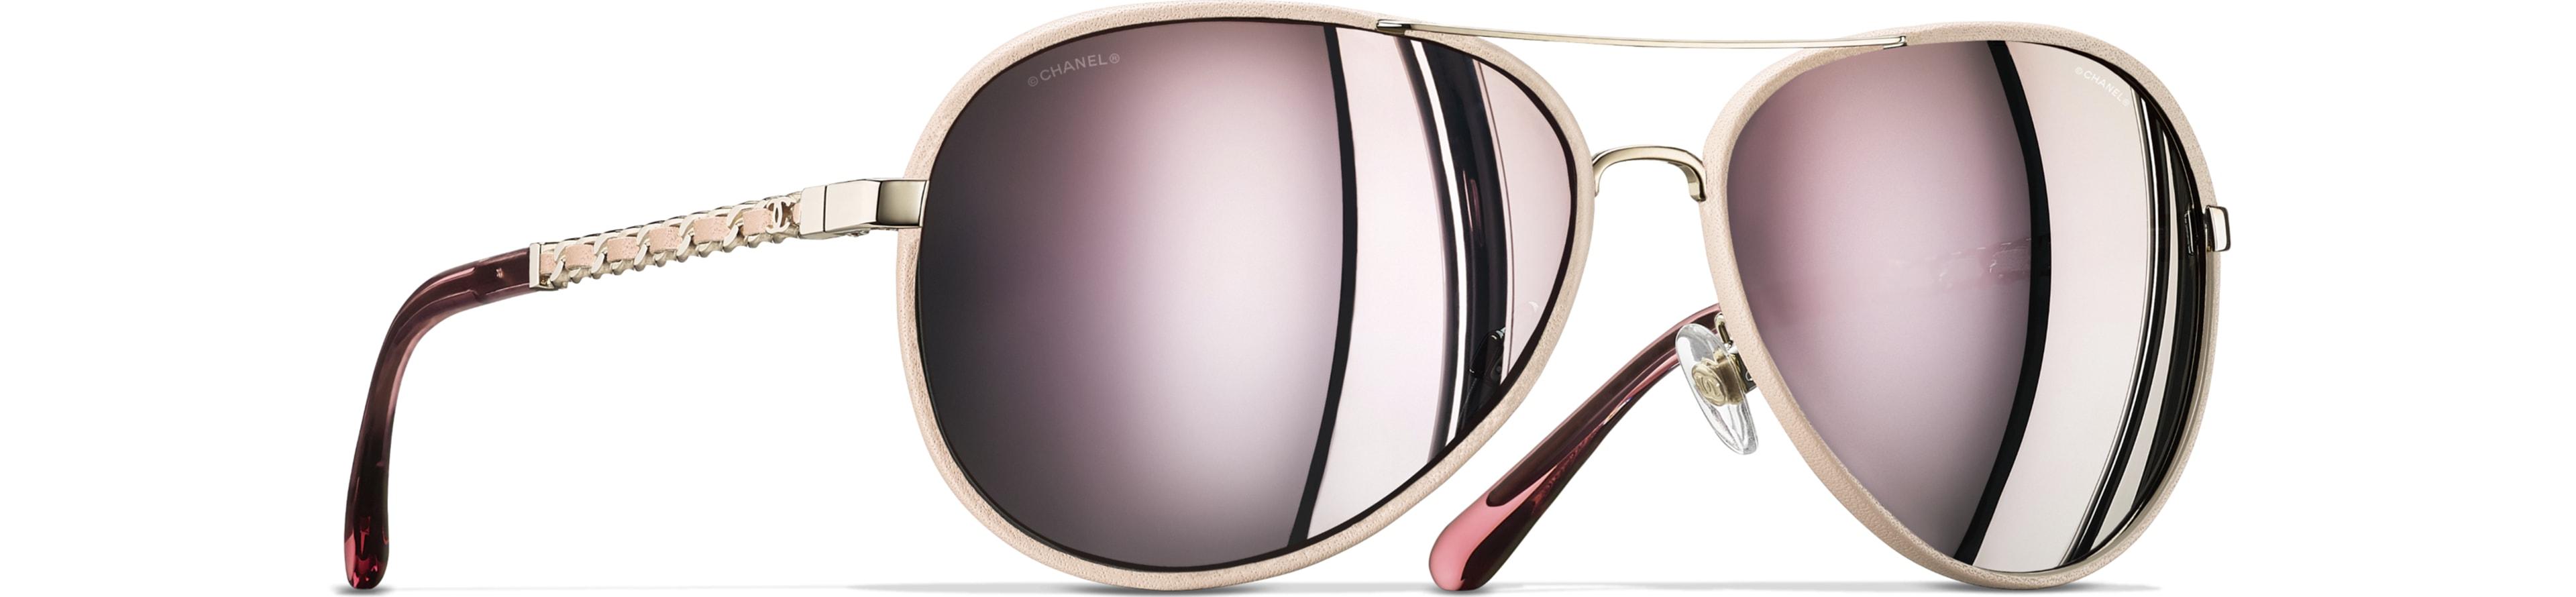 Metal & Calfskin light pink & gold frame. Pink mirror lenses